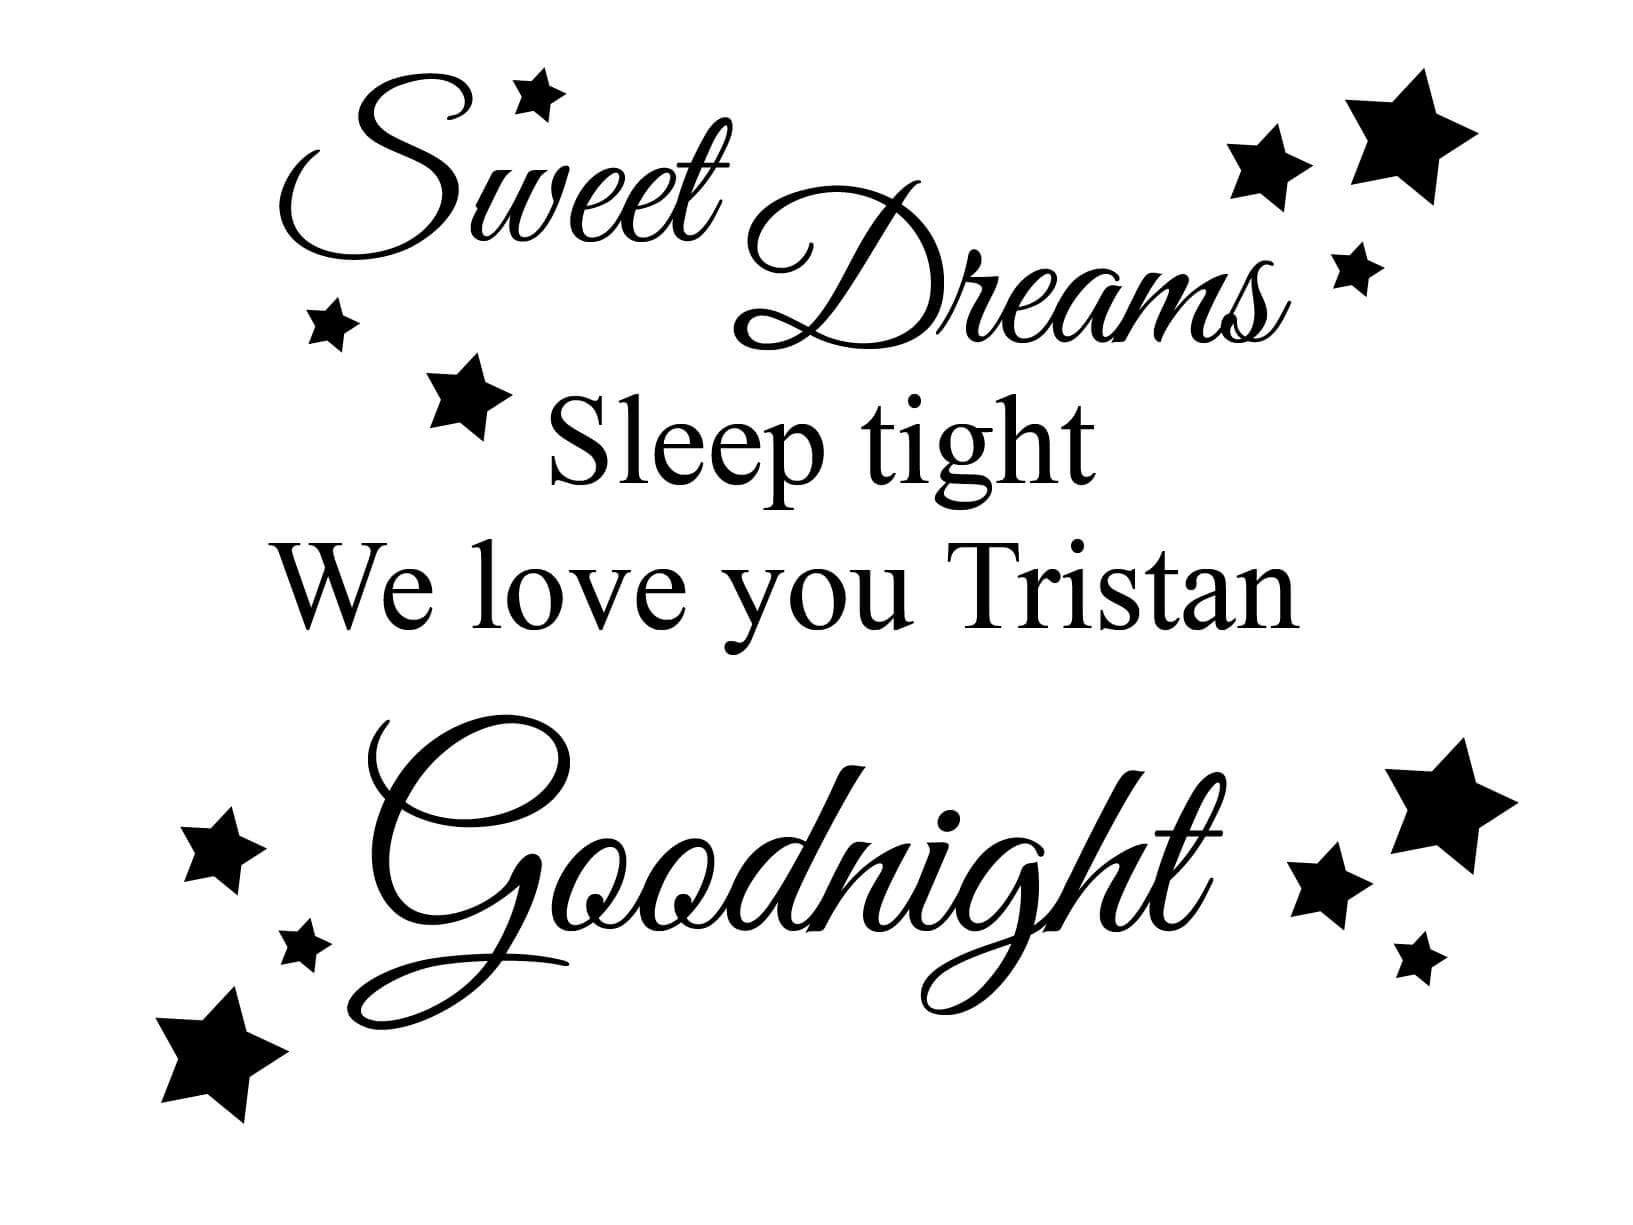 Muursticker Sweet dreams sleep tight We love you